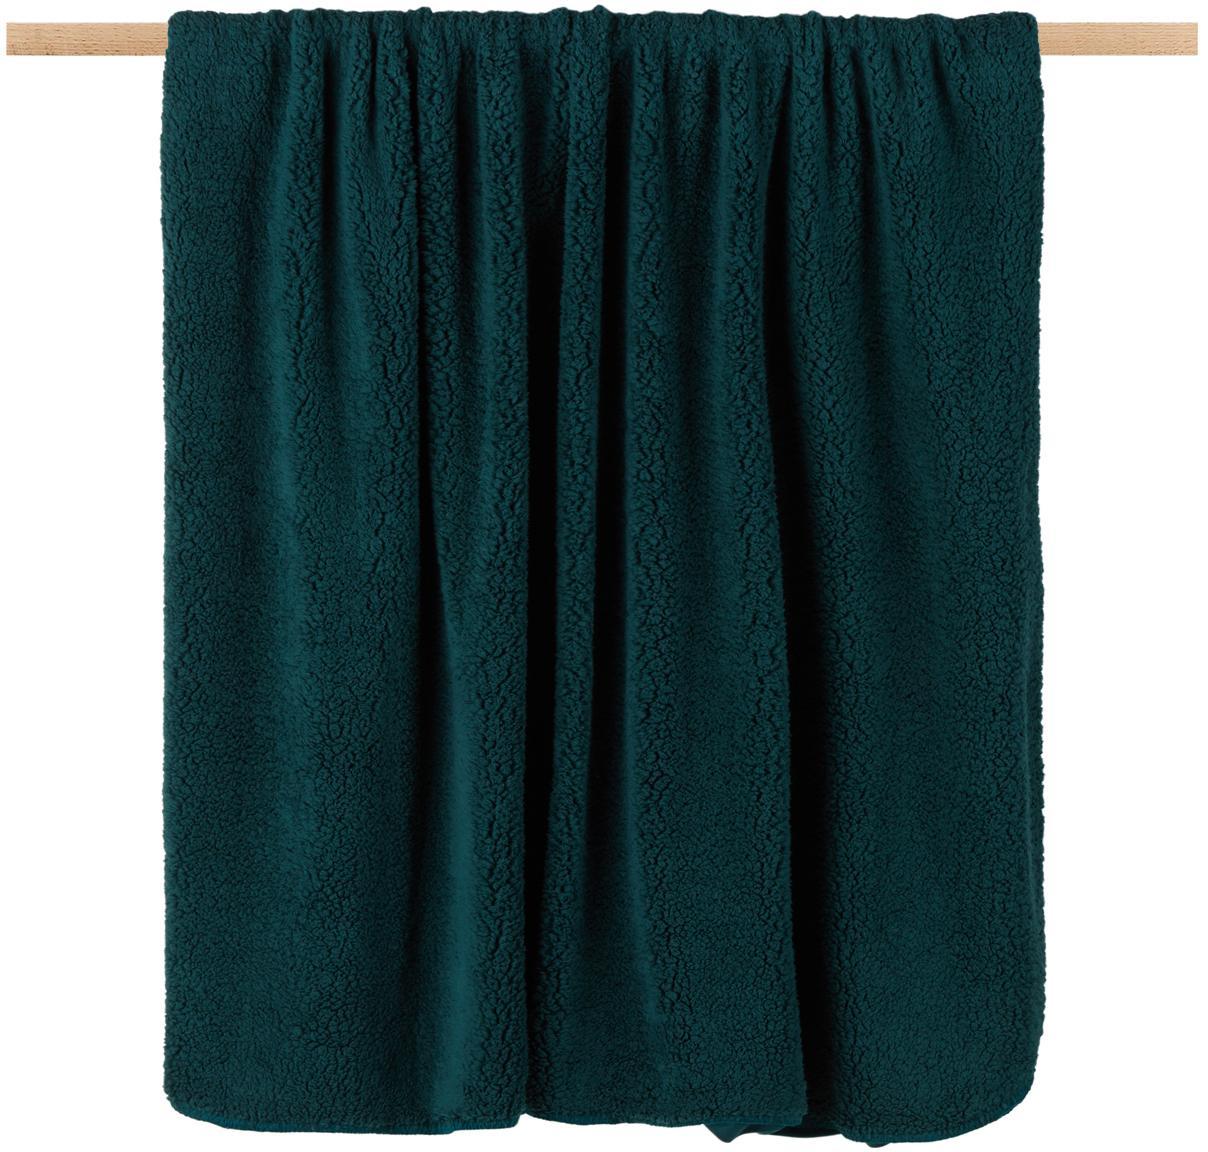 Kunstfell-Plaid Lammy, Vorderseite: Polyester (Kunstfell), Rückseite: Polyester, Tannengrün, 150 x 200 cm